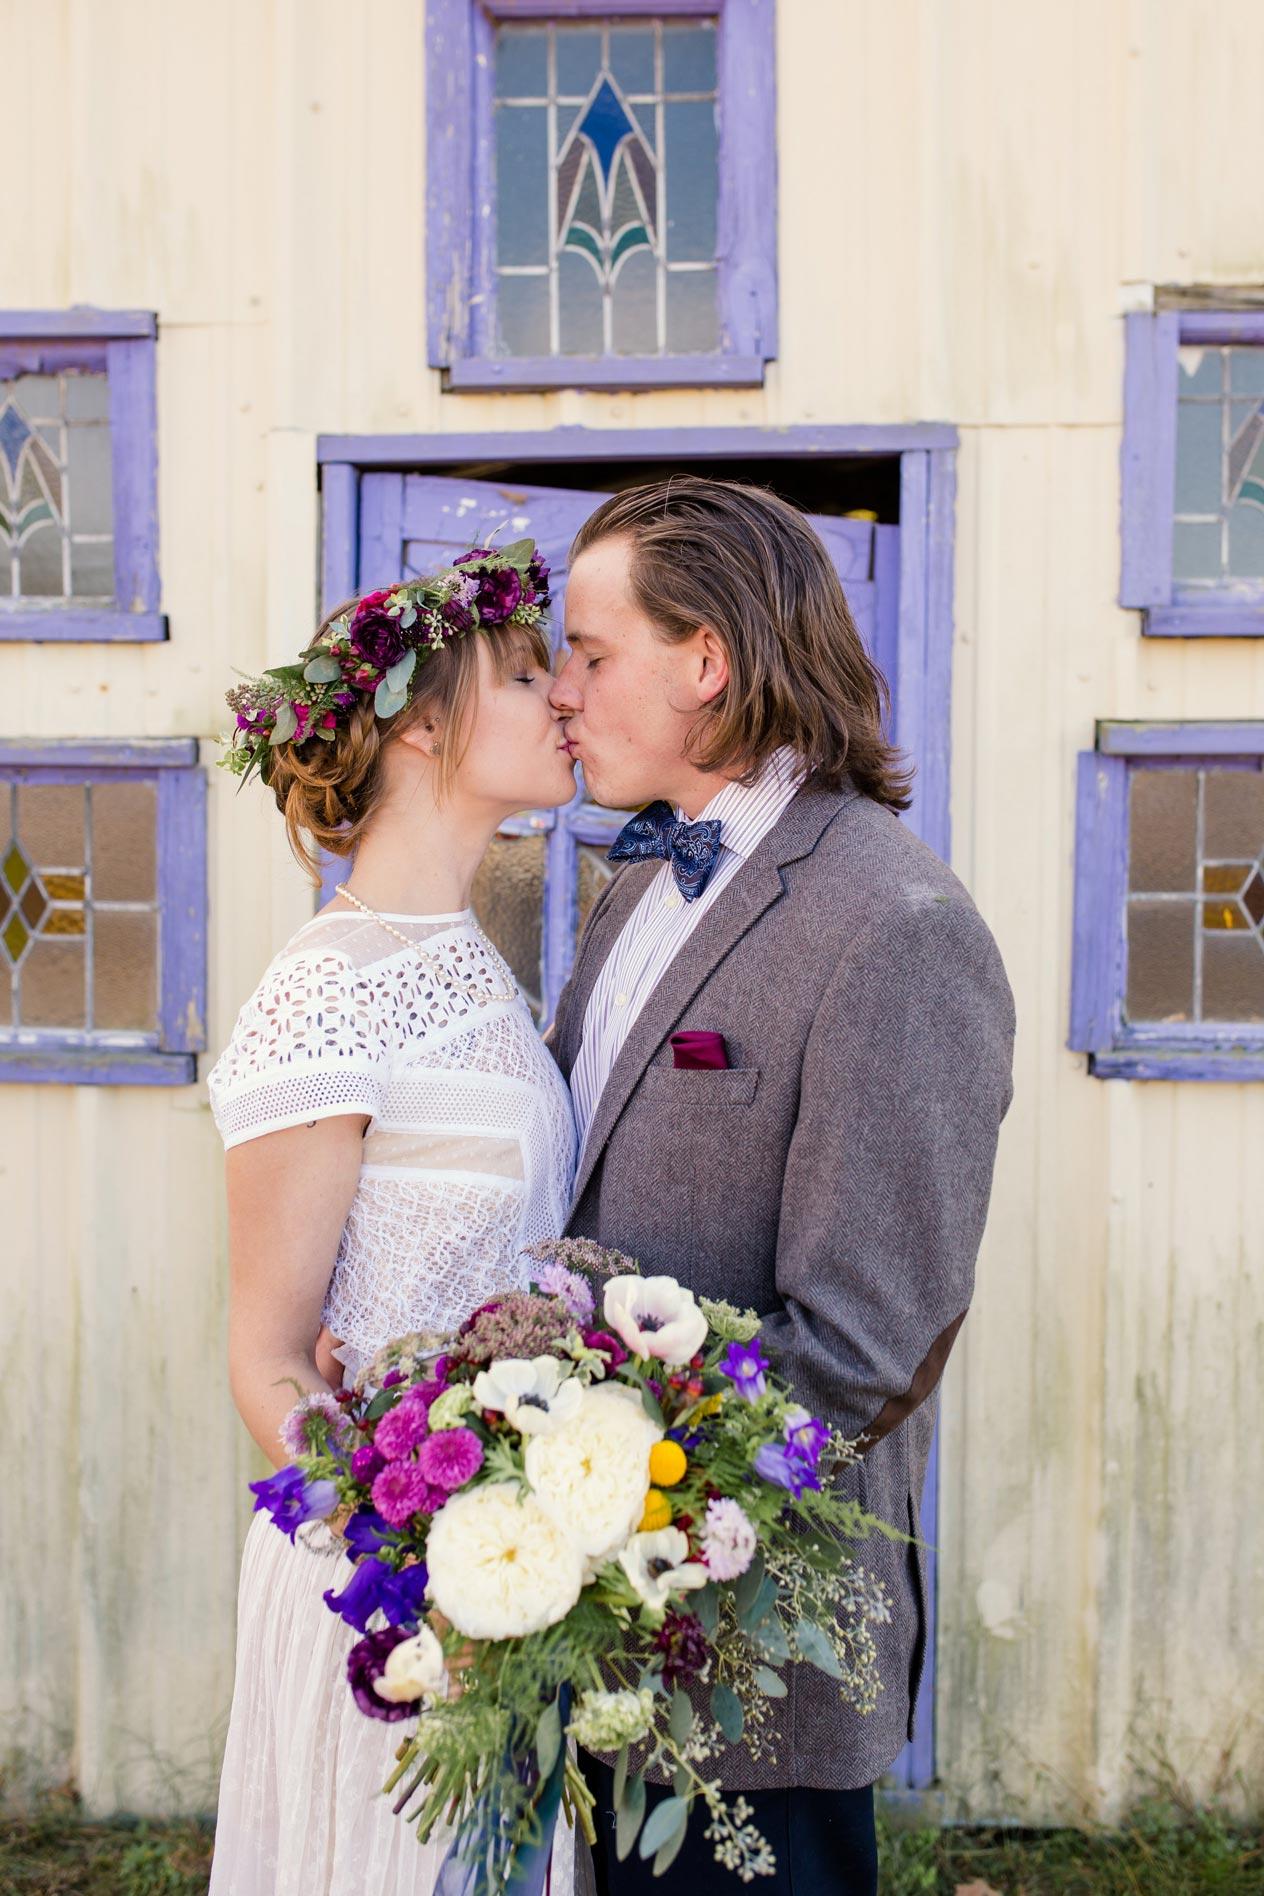 Rustic-Whimsical-Wedding- Tulsa-Wedding-FloristRobyns-Flower-Garden_Mallory-Hall-Photography12.jpg